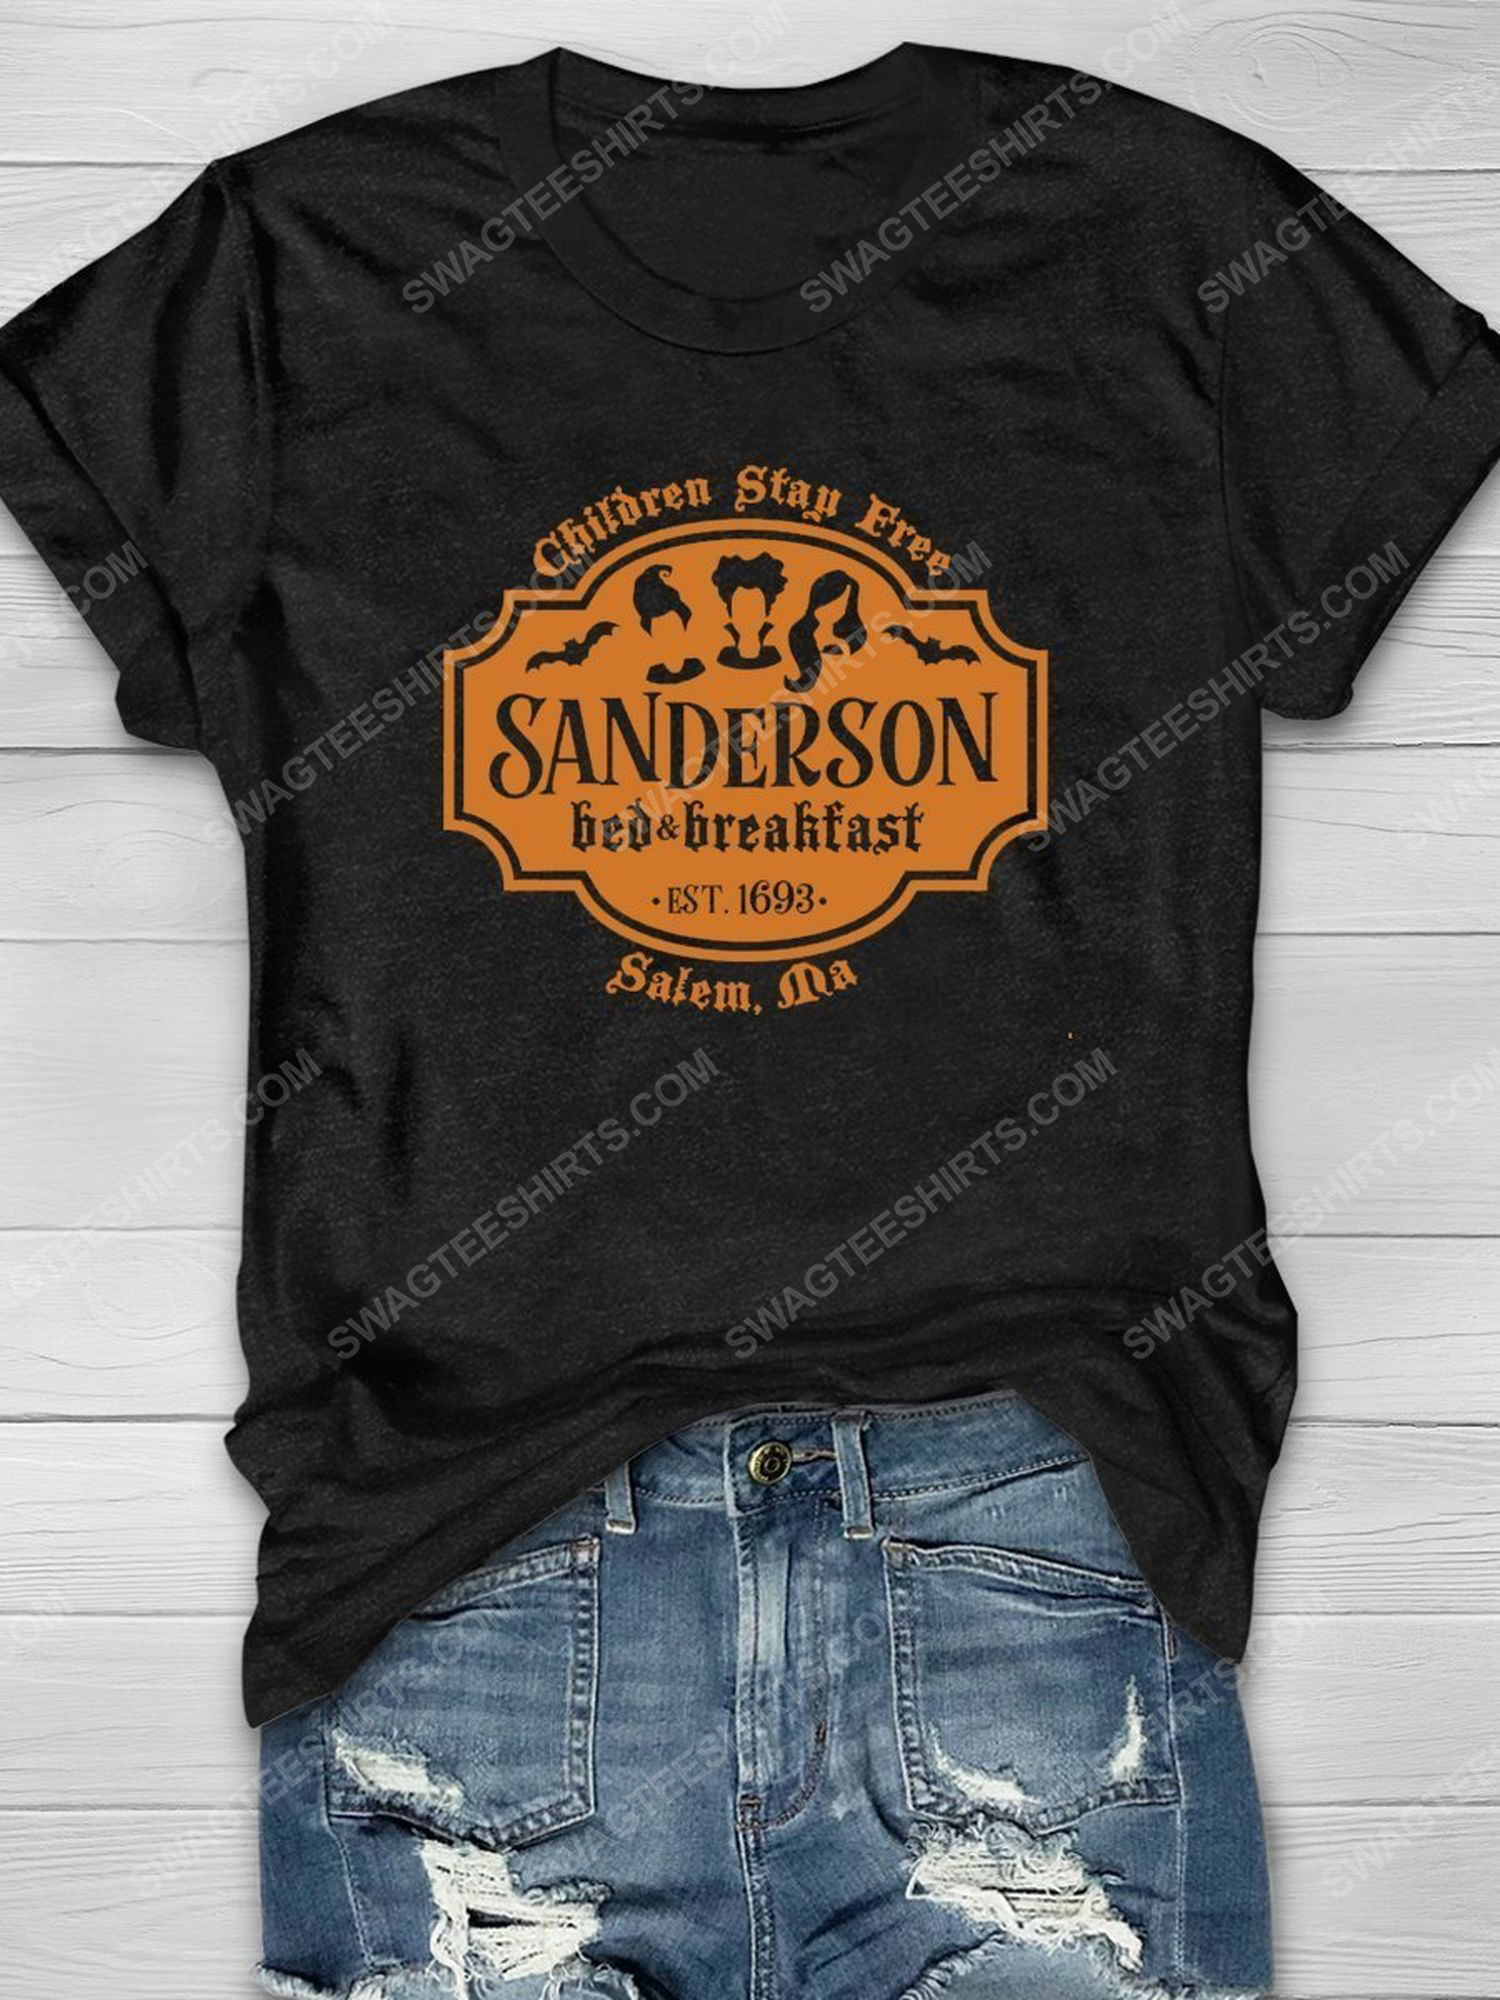 Halloween children stay free sanderson bed breakfast shirt 1 - Copy (3)